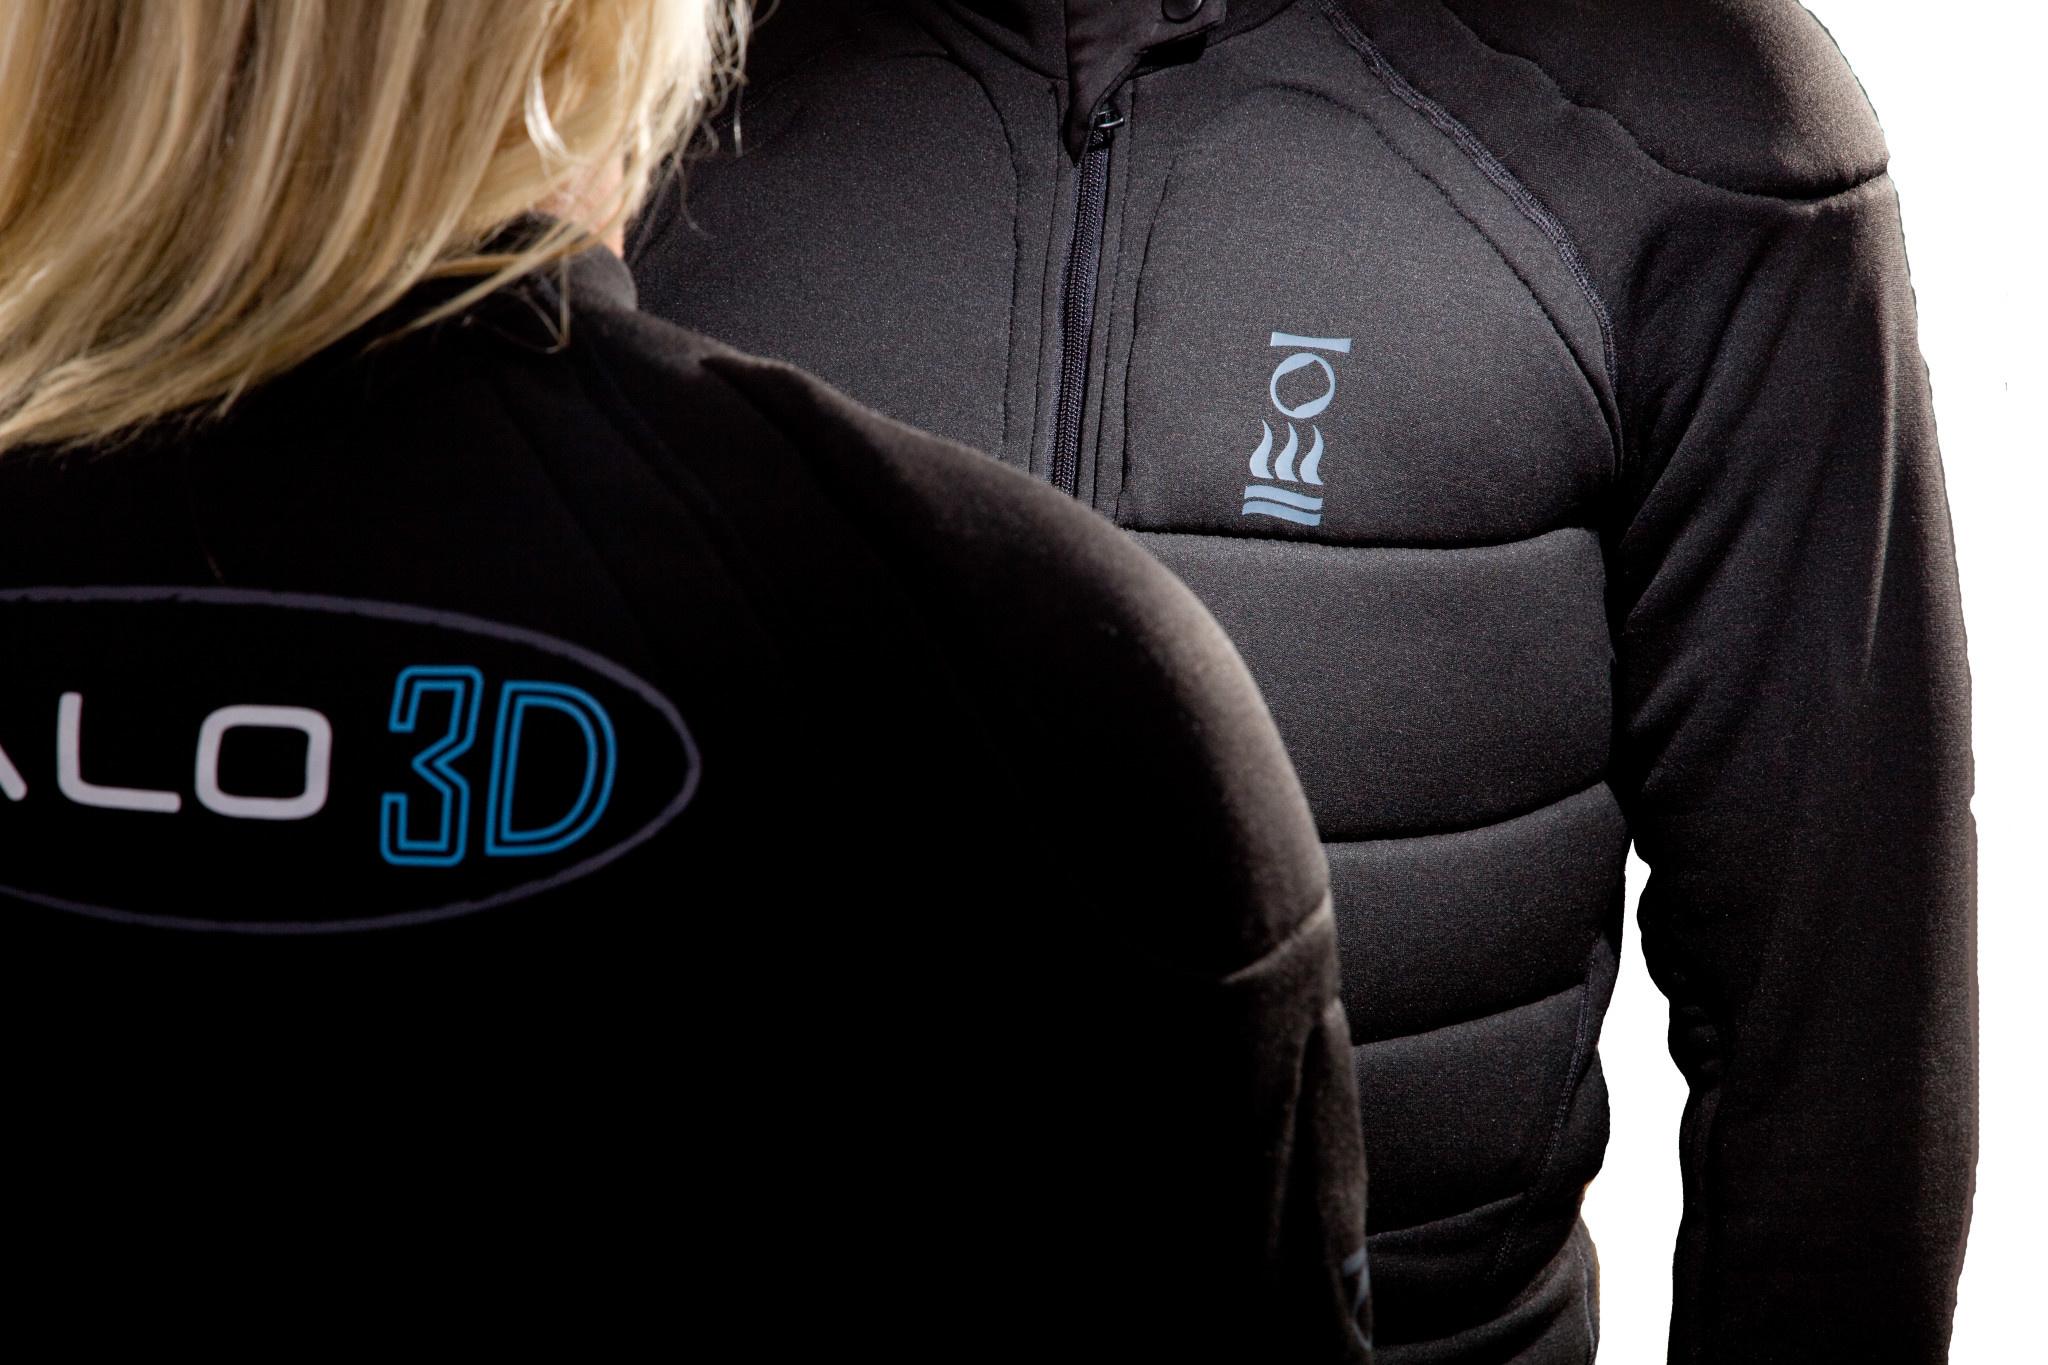 Halo 3D Onderpak Dames-4